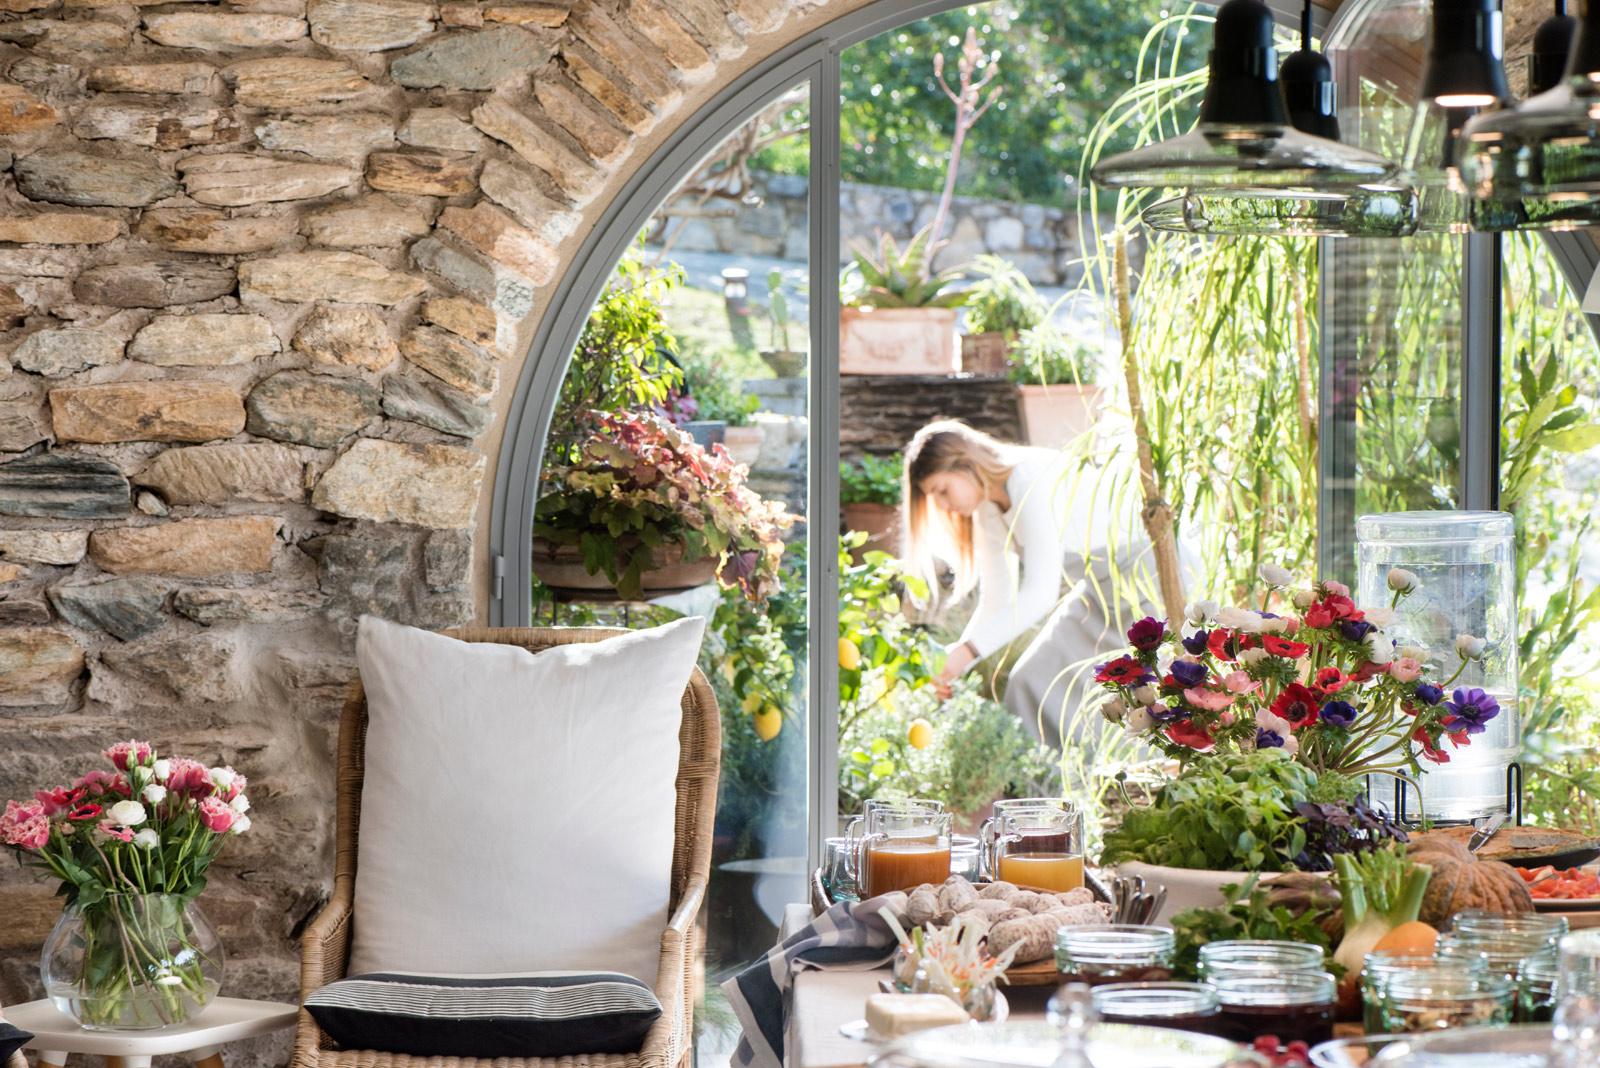 Gilda Forte dei Marmi | Interior | Breakfast